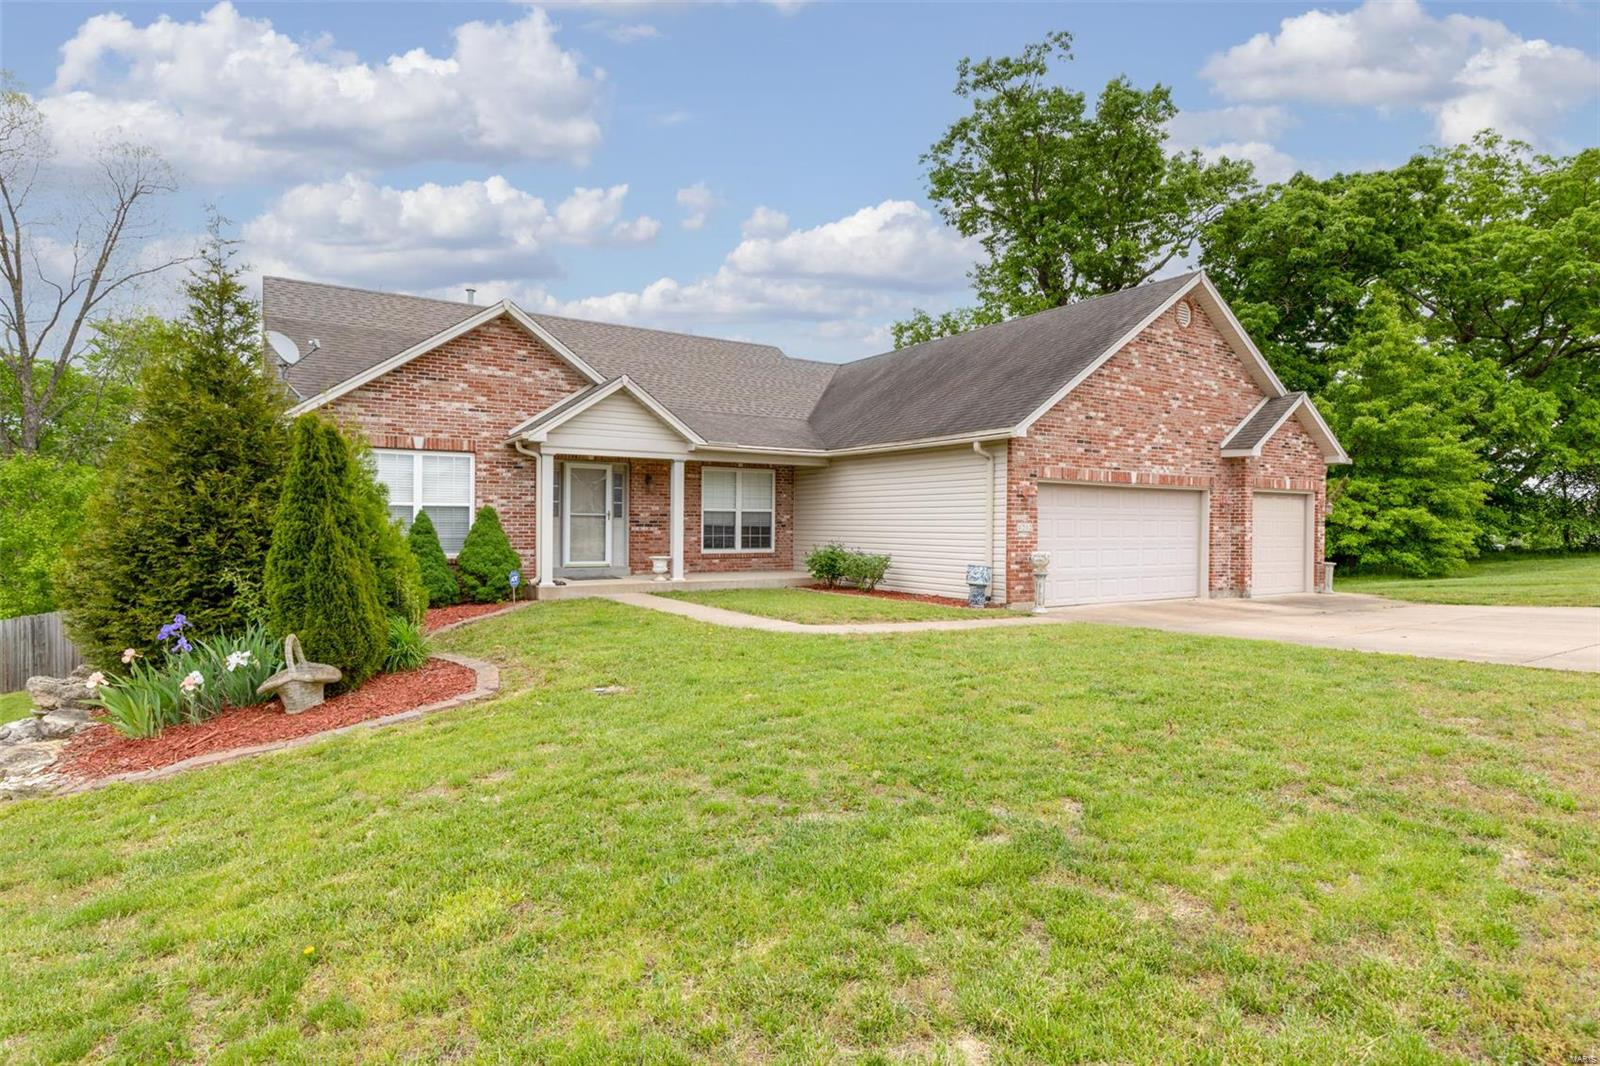 1212 Crystal Cove Property Photo - Festus, MO real estate listing